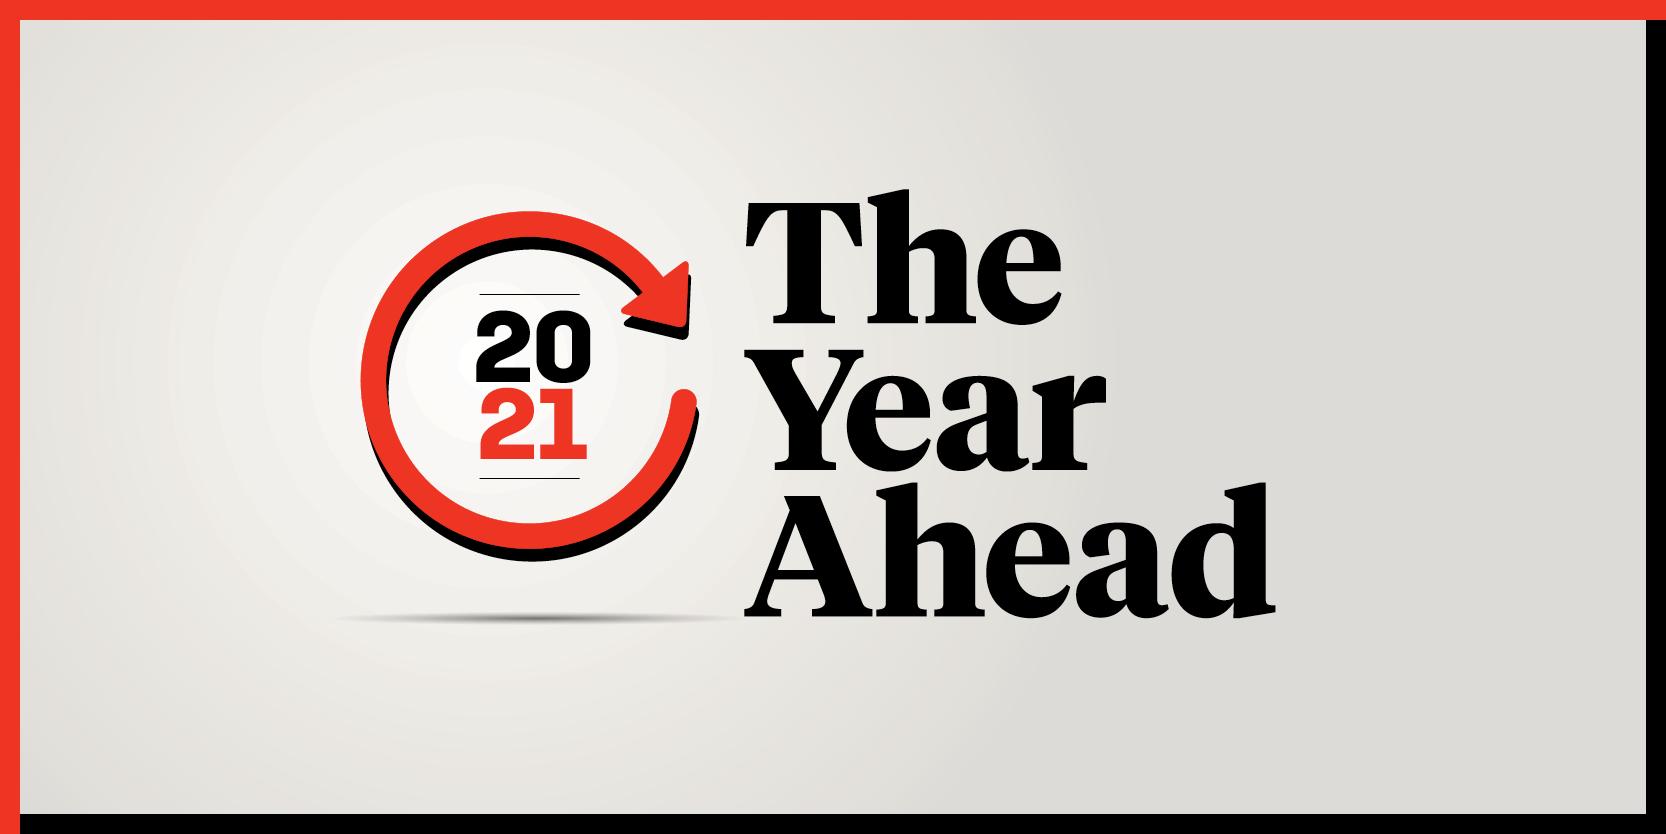 2021 The Year Ahead logo